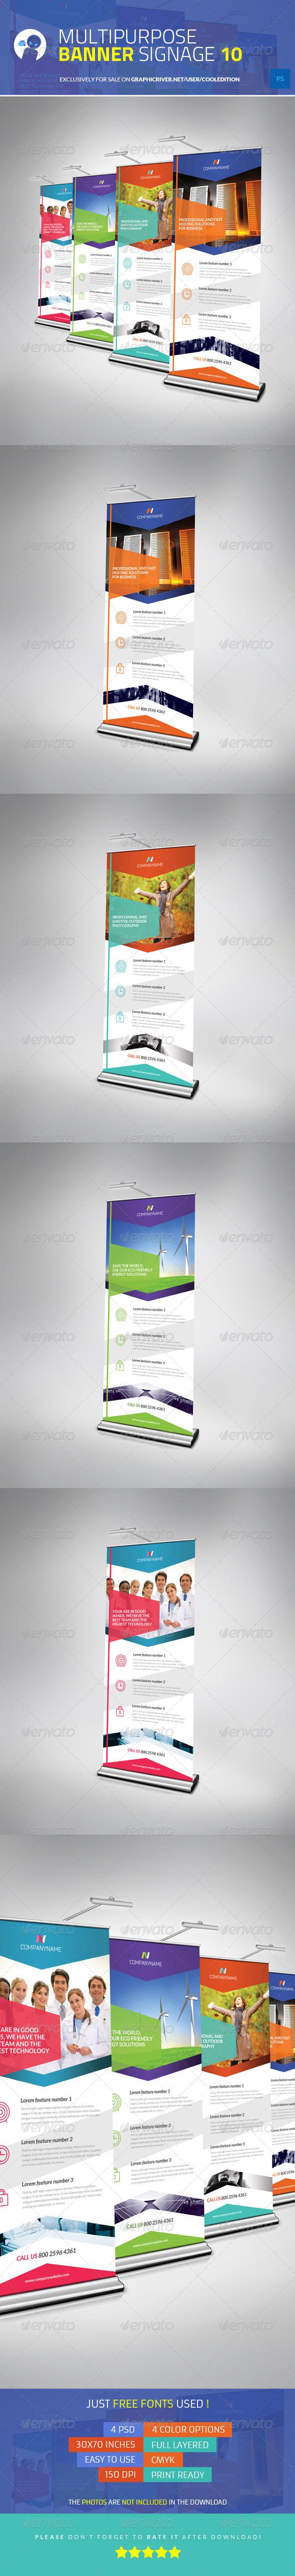 GraphicRiver Multipurpose Banner Signage 10 5633383